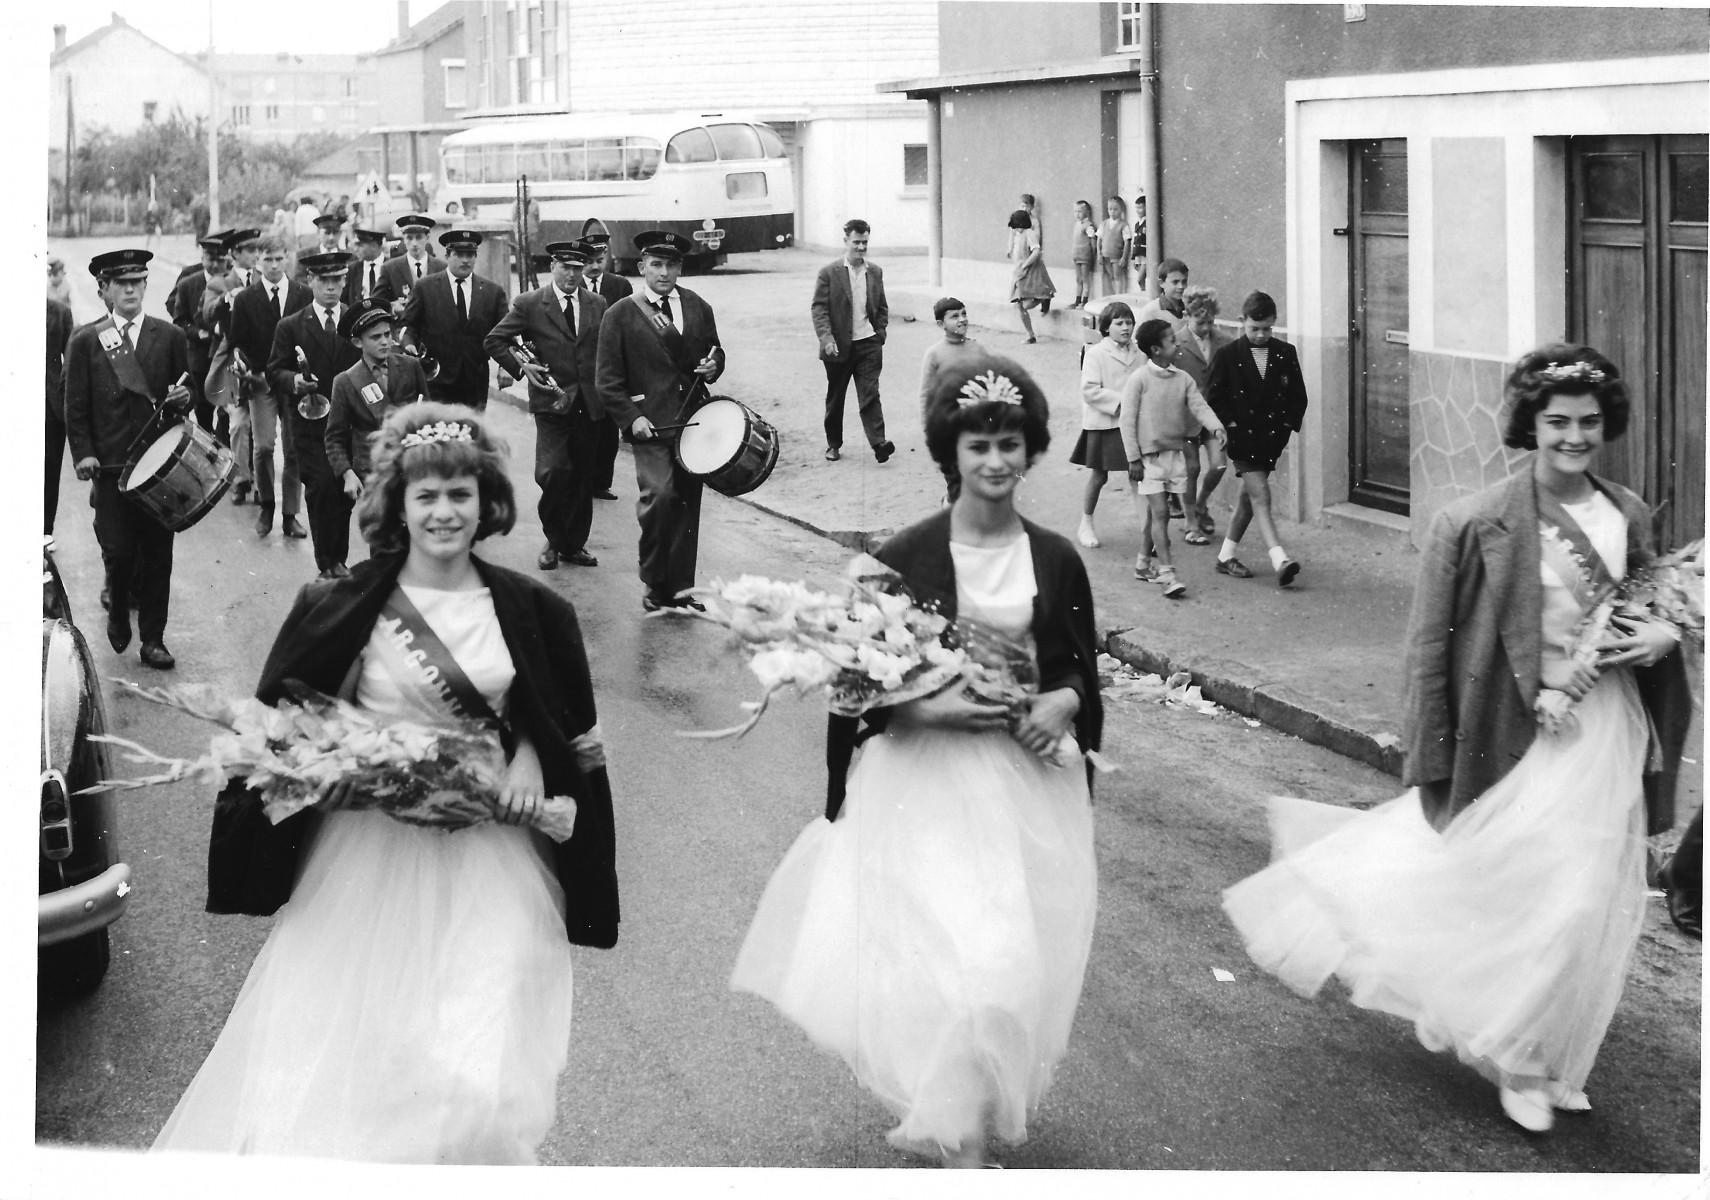 26-Docs-Lydie-Gascoin-14-Fête-de-lArgonne-1962-rue-de-lArgonne-2-09-1963